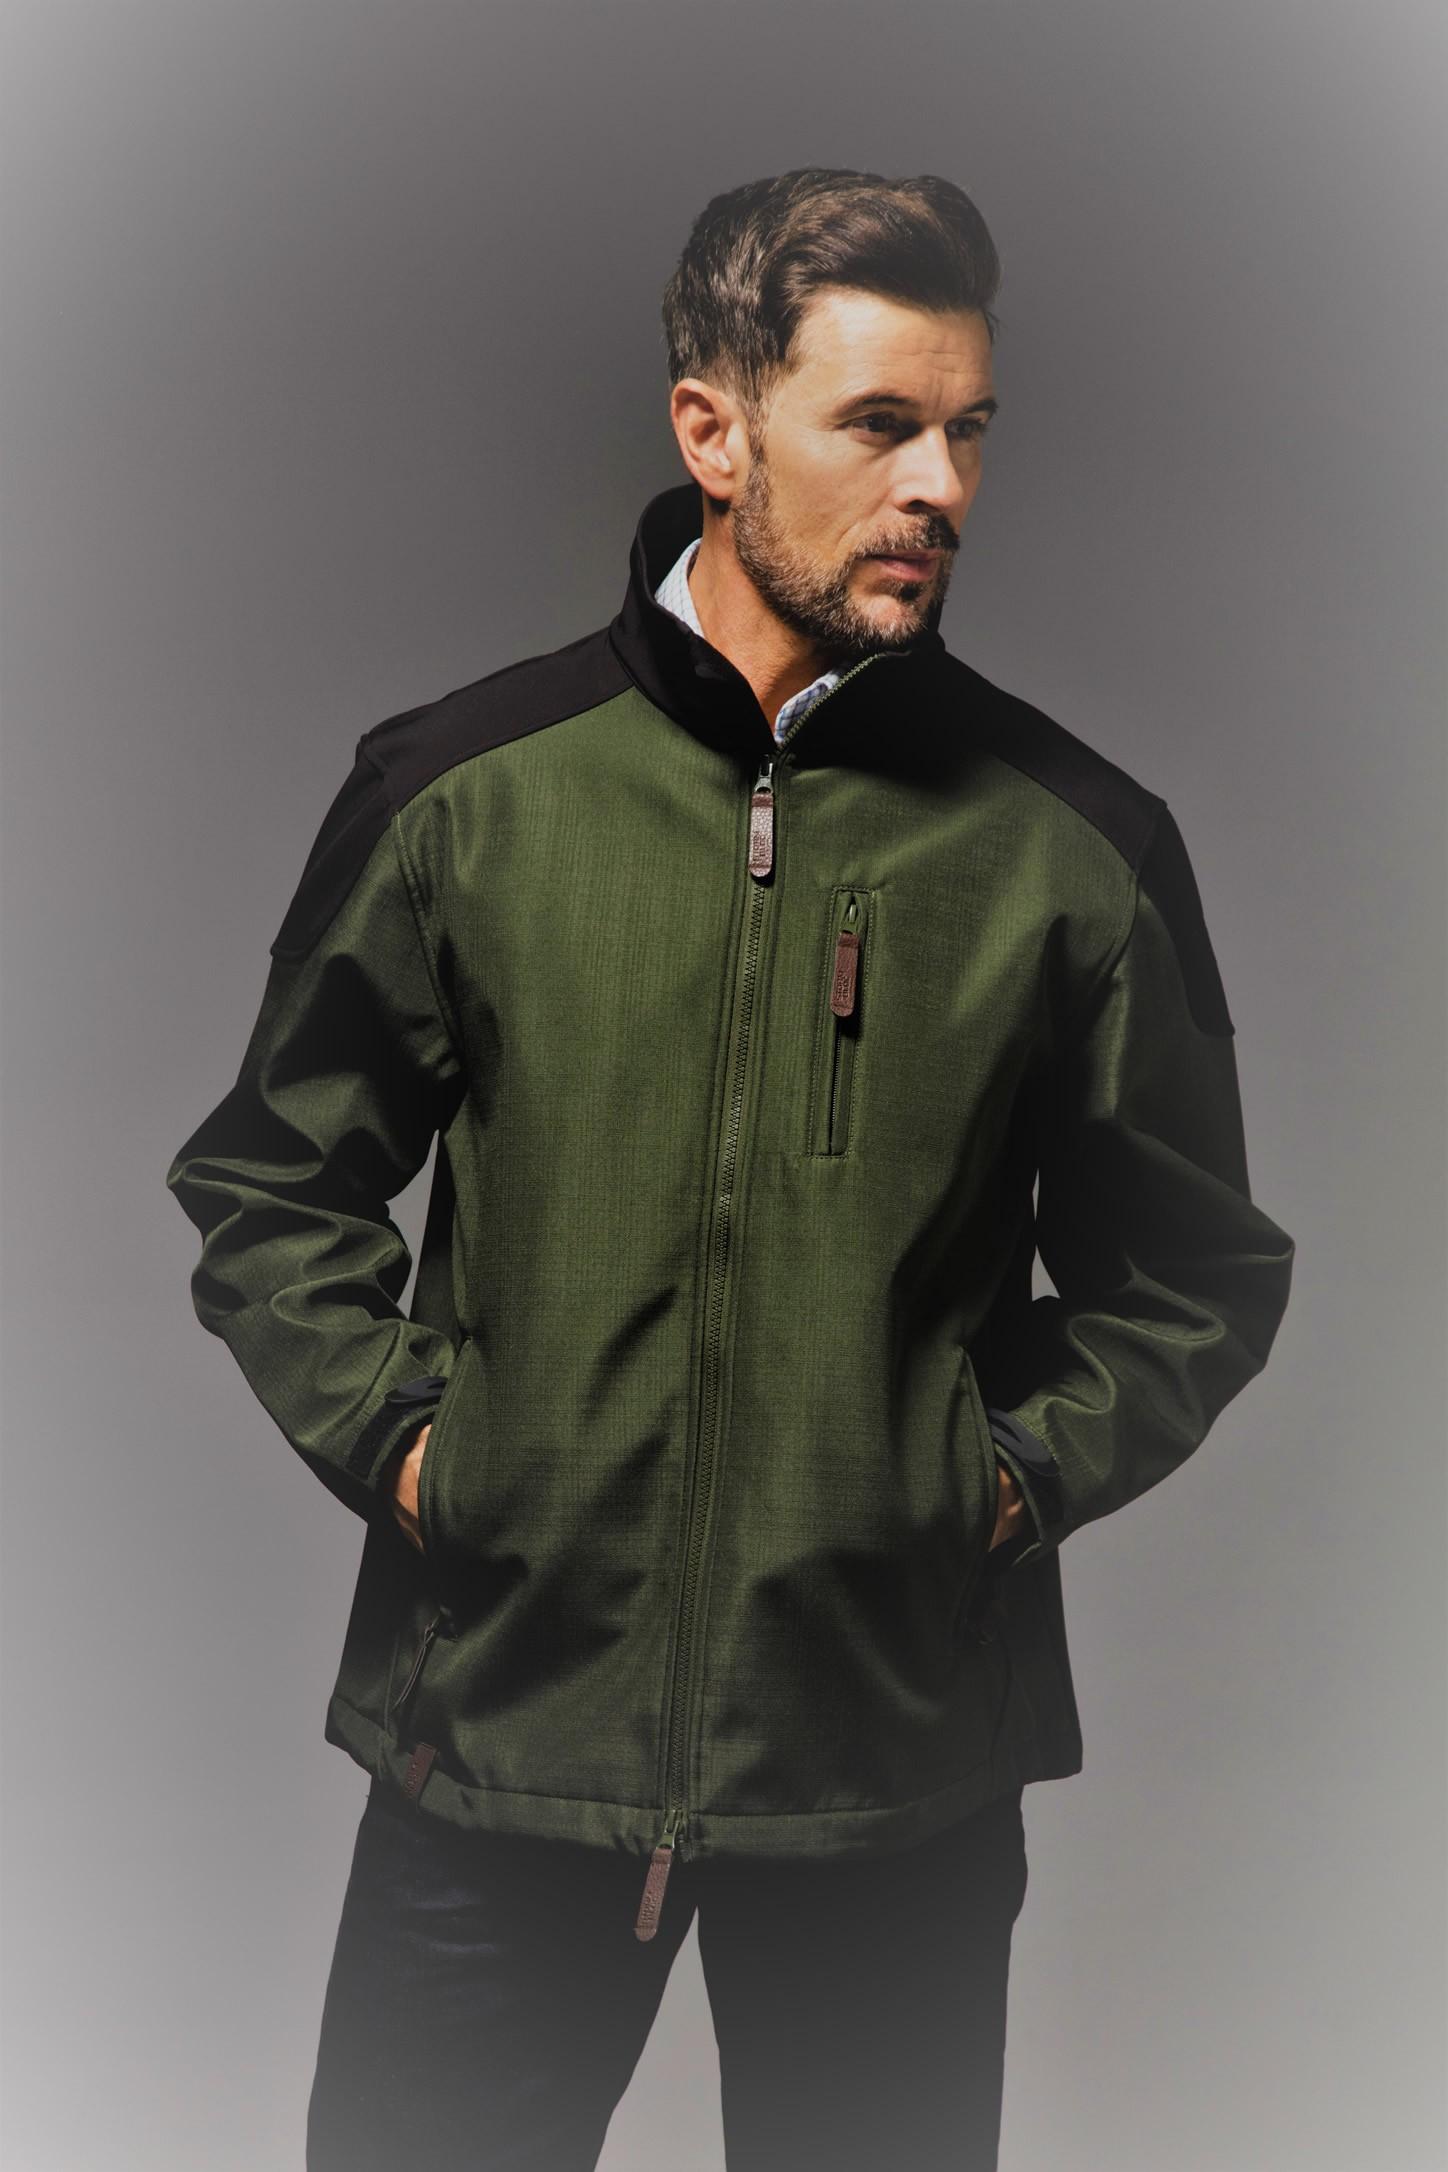 StormBloc Hay Lake Soft Shell Jacket